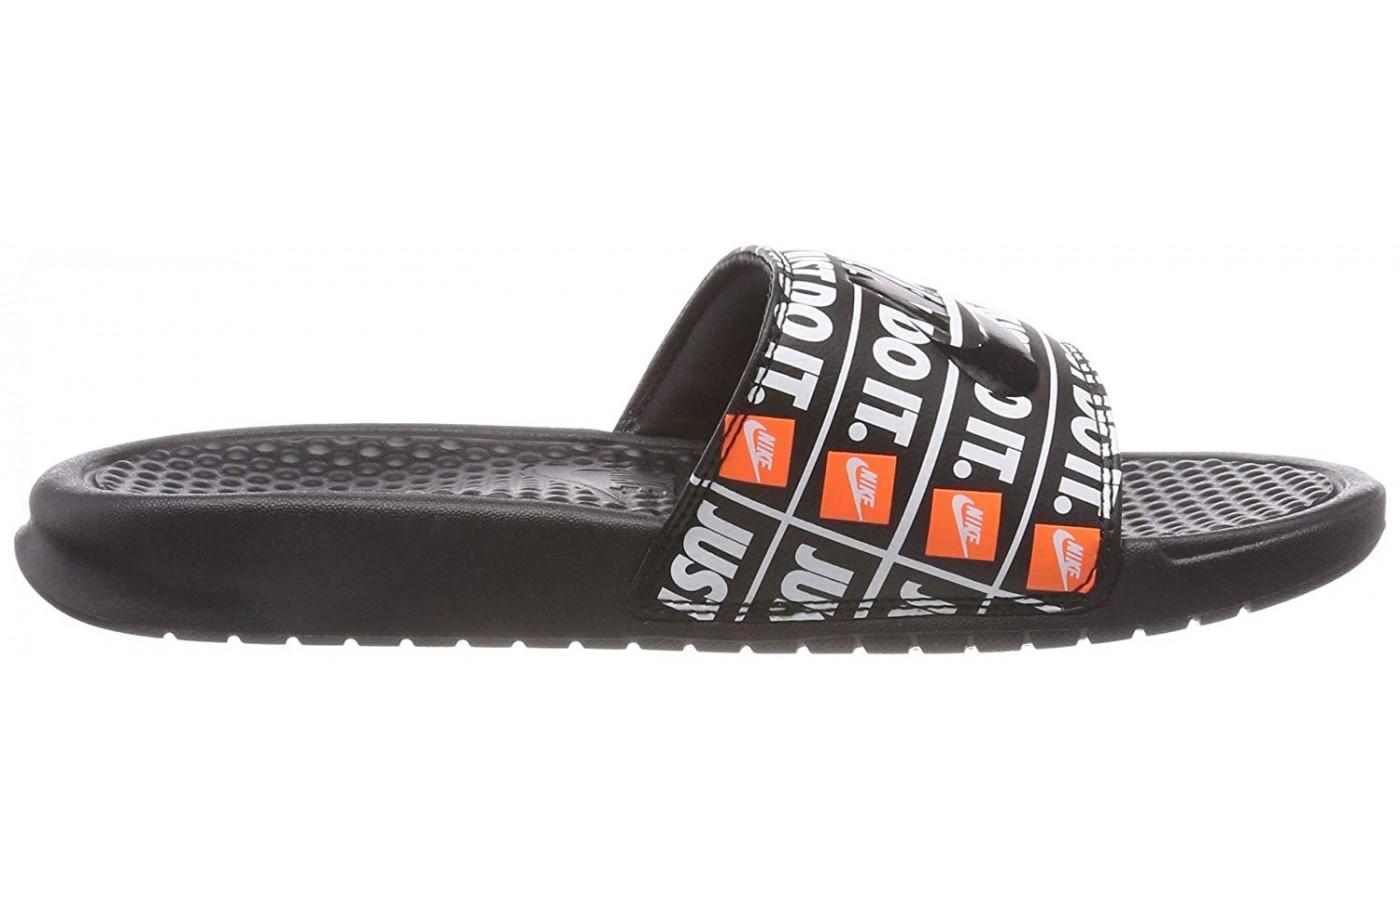 Nike Benassi JDI Slide Outsole